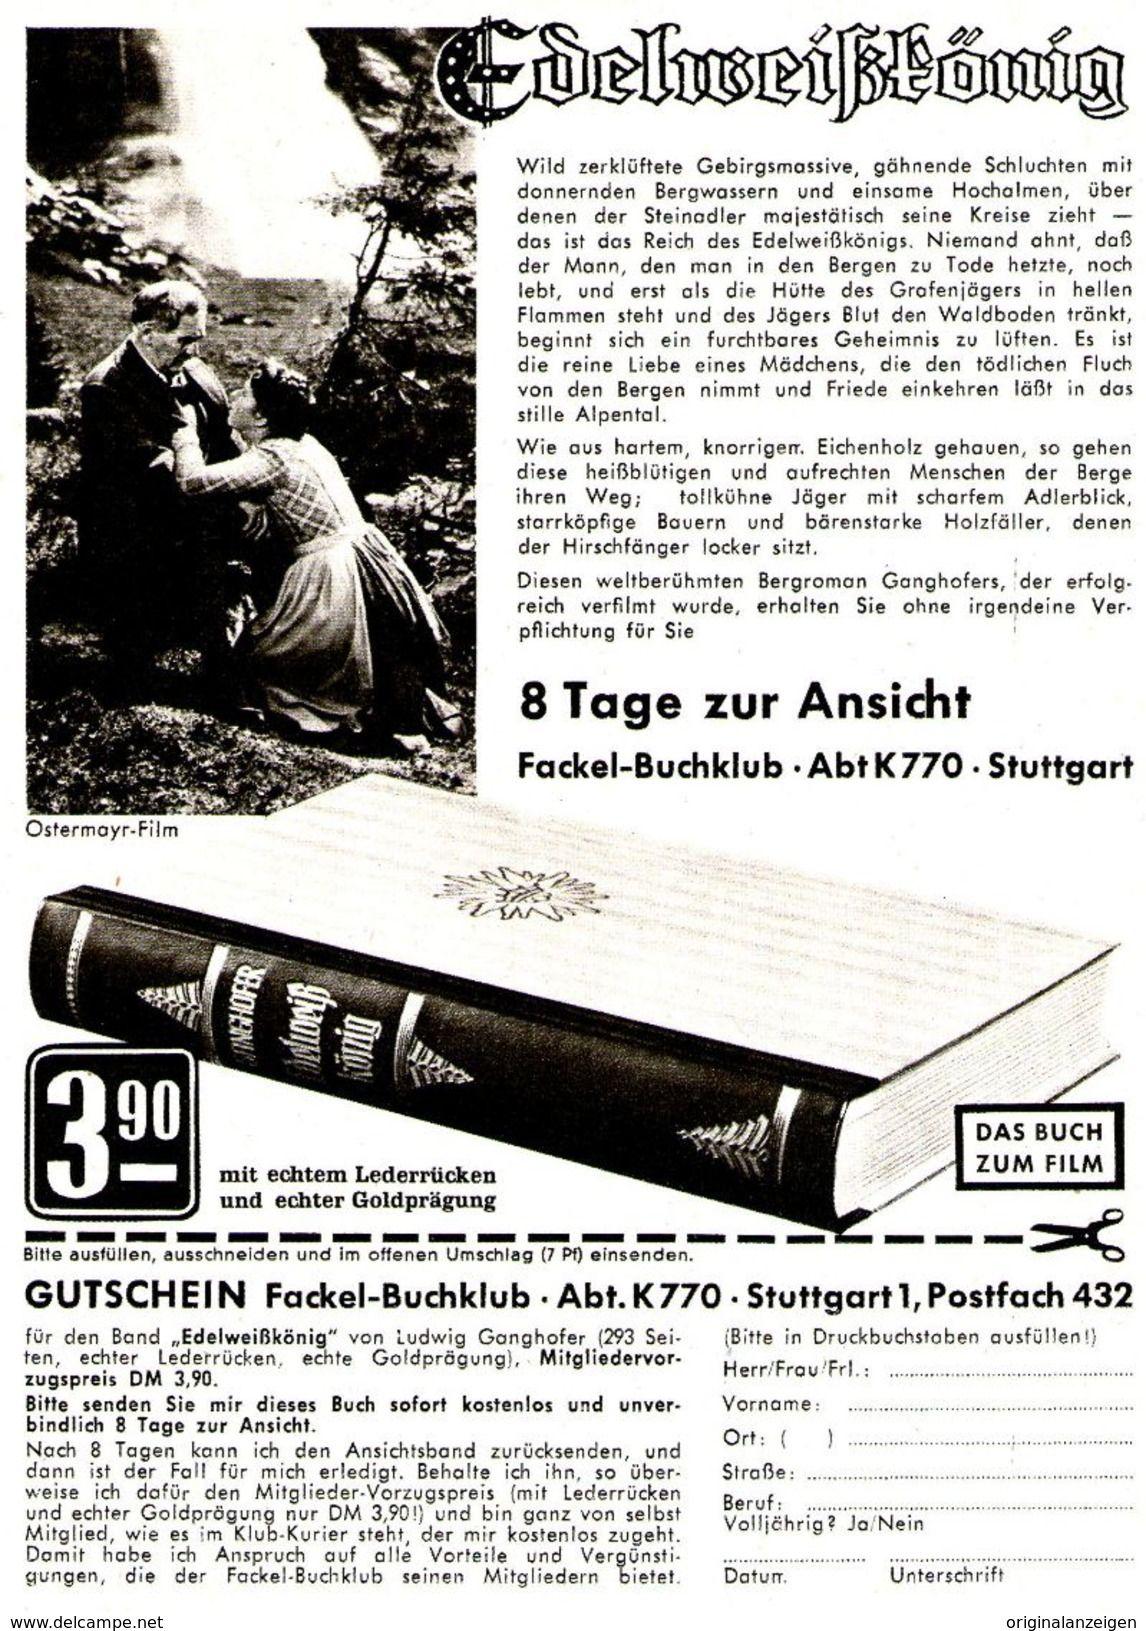 Original-Werbung/ Anzeige 1962 - FACKEL BUCHKLUB STUTTGART/ MOTIV EDELWEISSKÖNIG- FILM PETER OSTERMAYR - Ca.120 X 170 Mm - Werbung